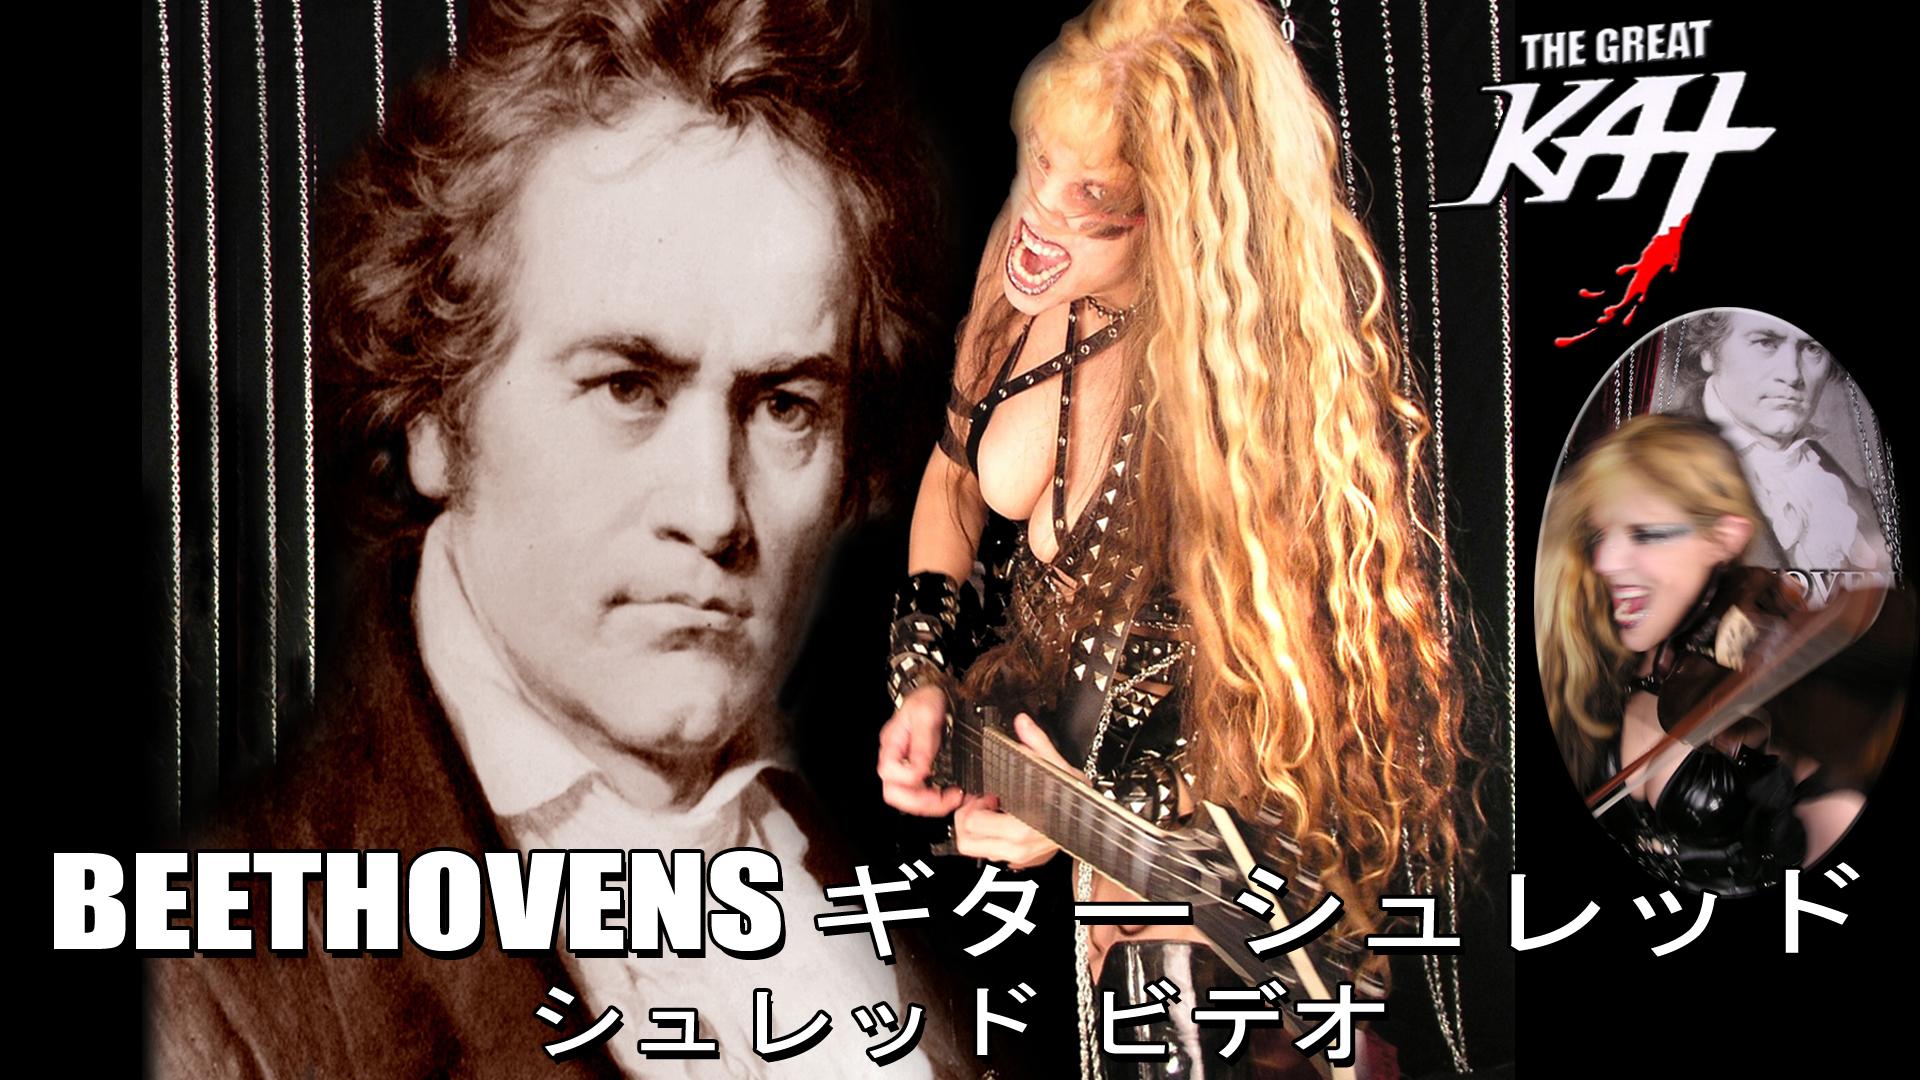 The Great Kat - Beethovens ギター シュレッド - シュレッド ビデオ